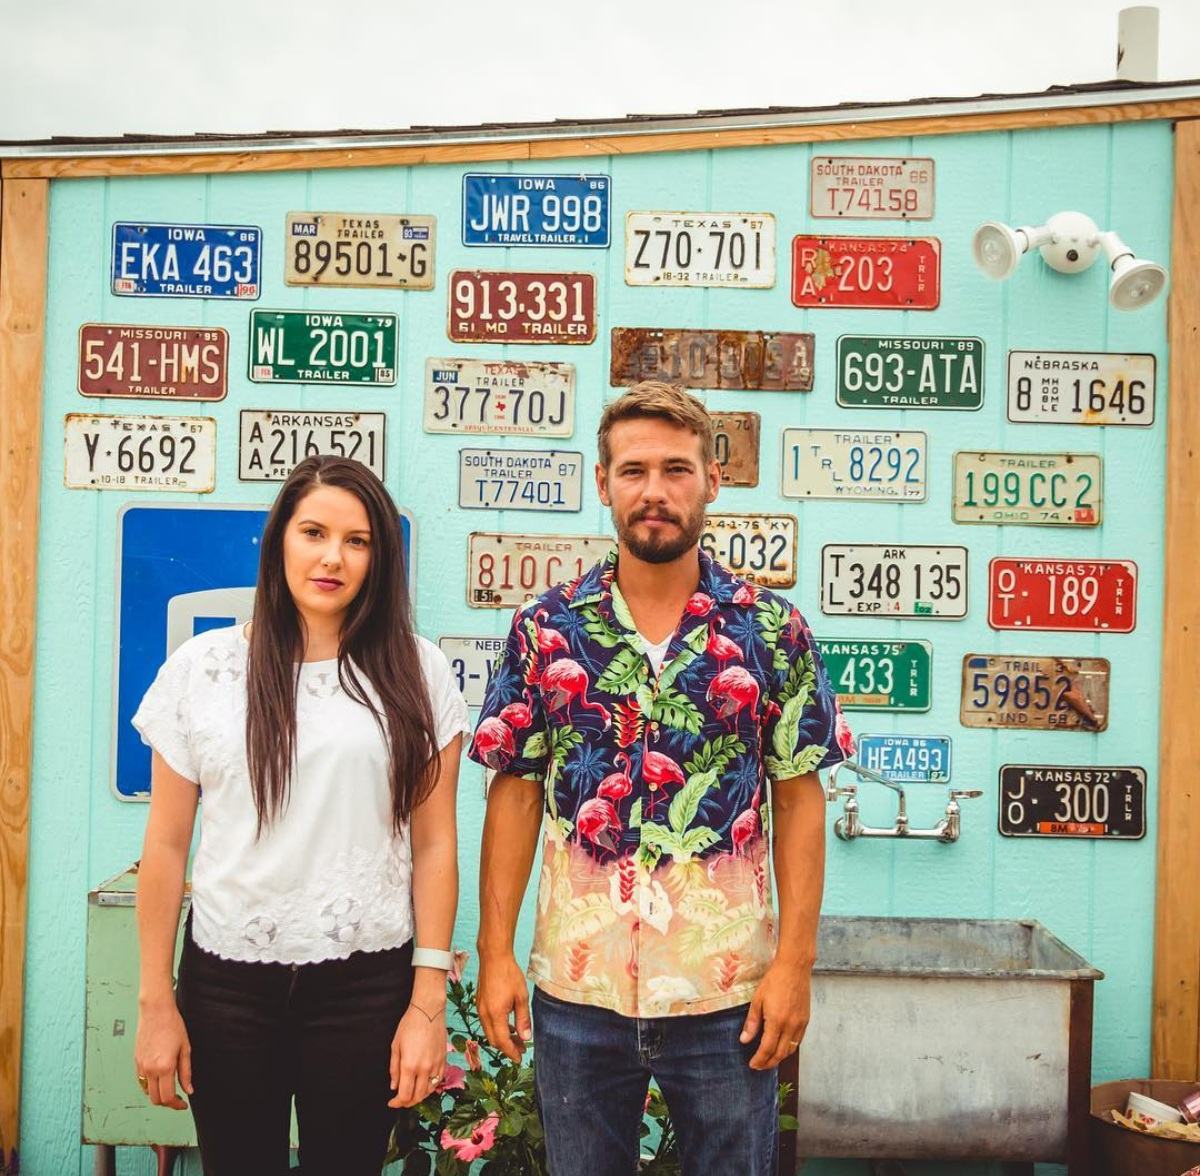 Zack+Laura+Flamingo+Springs+Arkansas.jpg